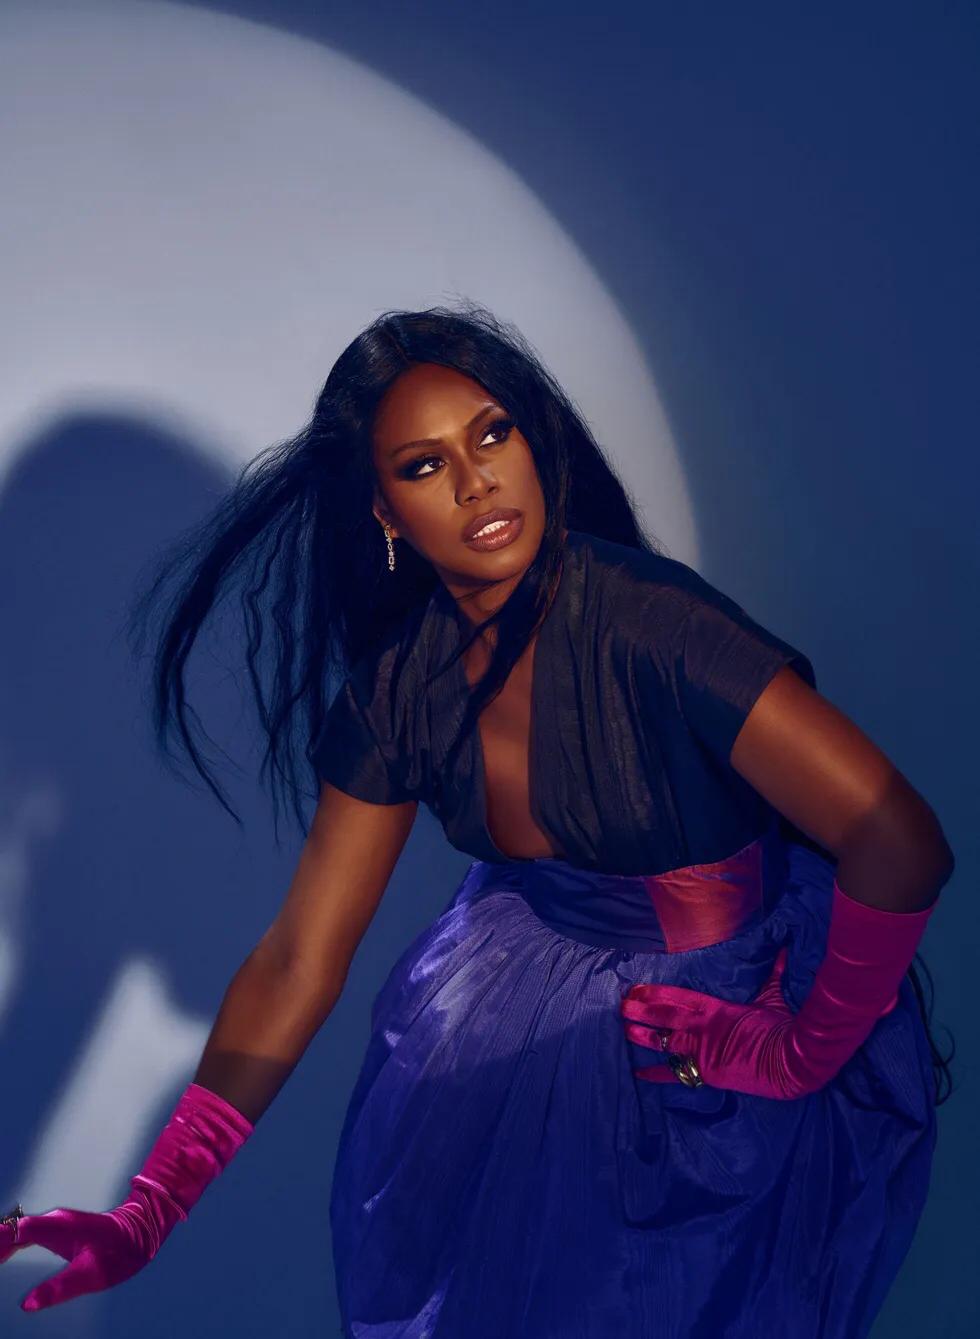 paper-magazine-black-woman-bad-hair-Hulu